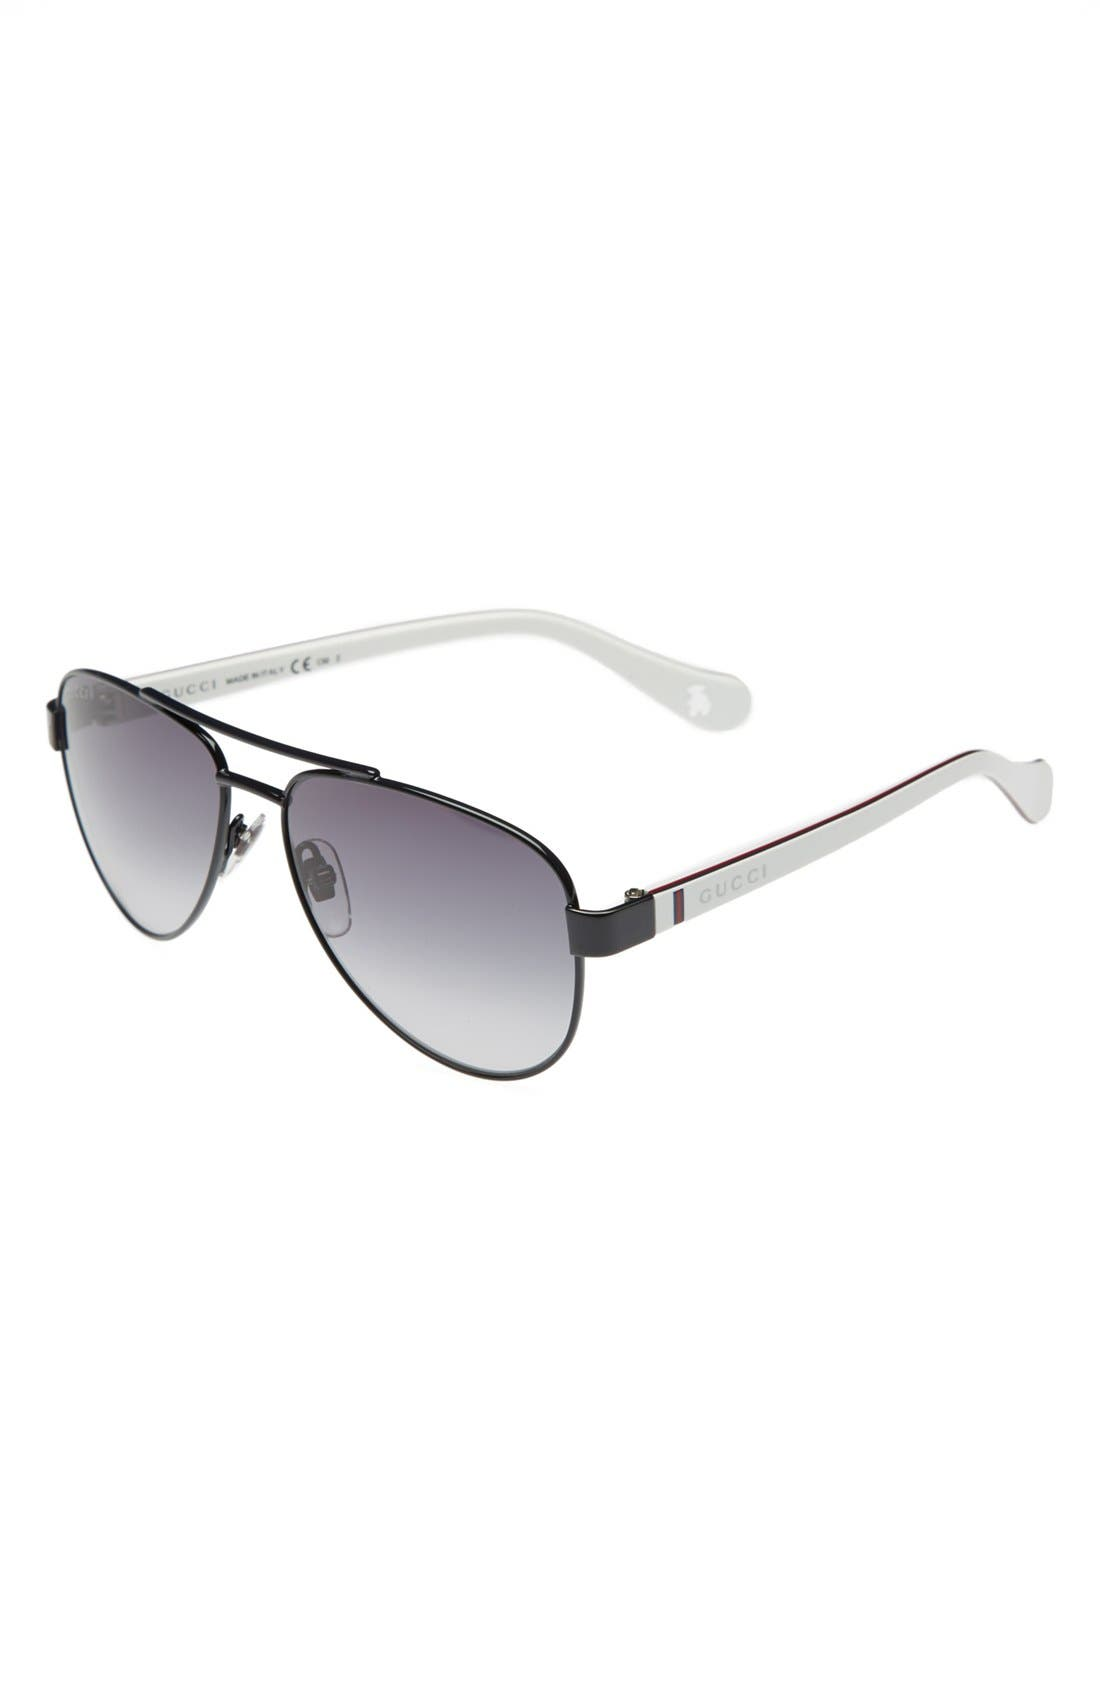 Main Image - Gucci 51mm Aviator Sunglasses (Kids)